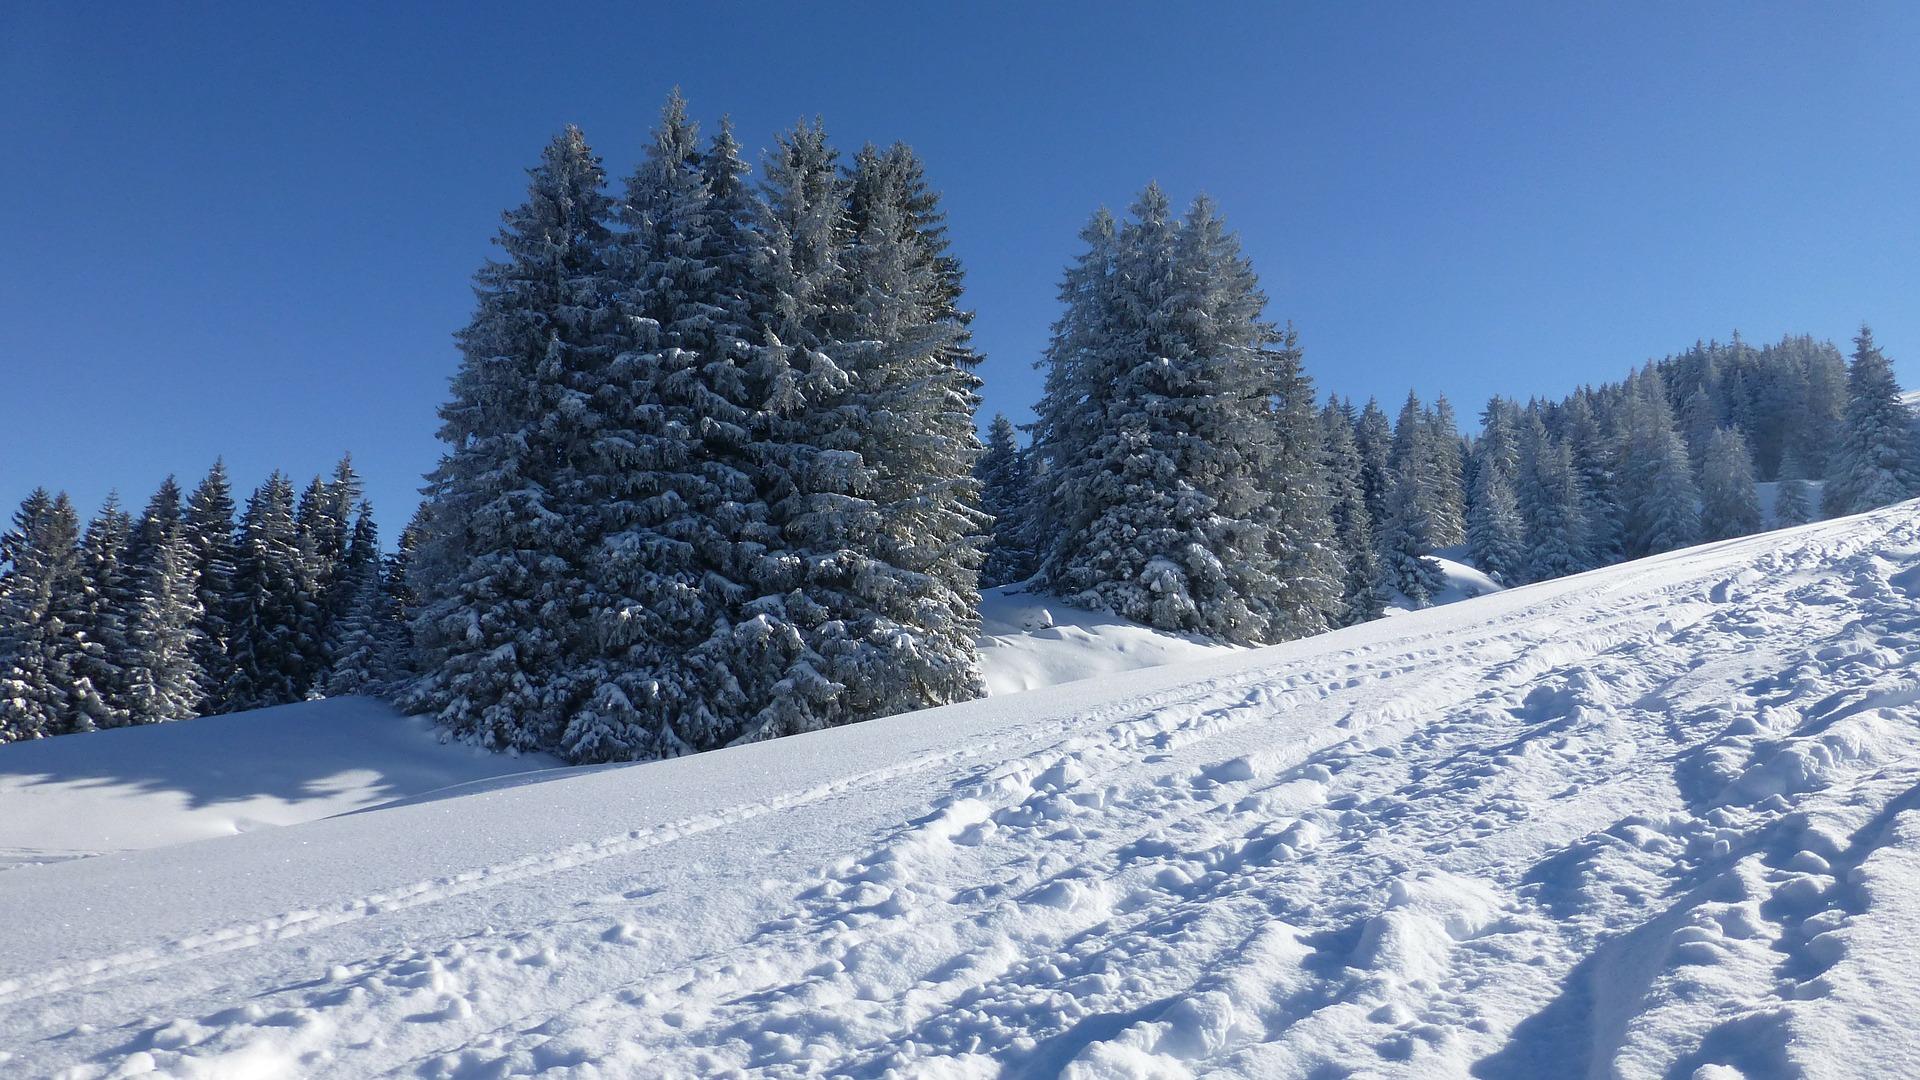 Winterwandern im Allgäu